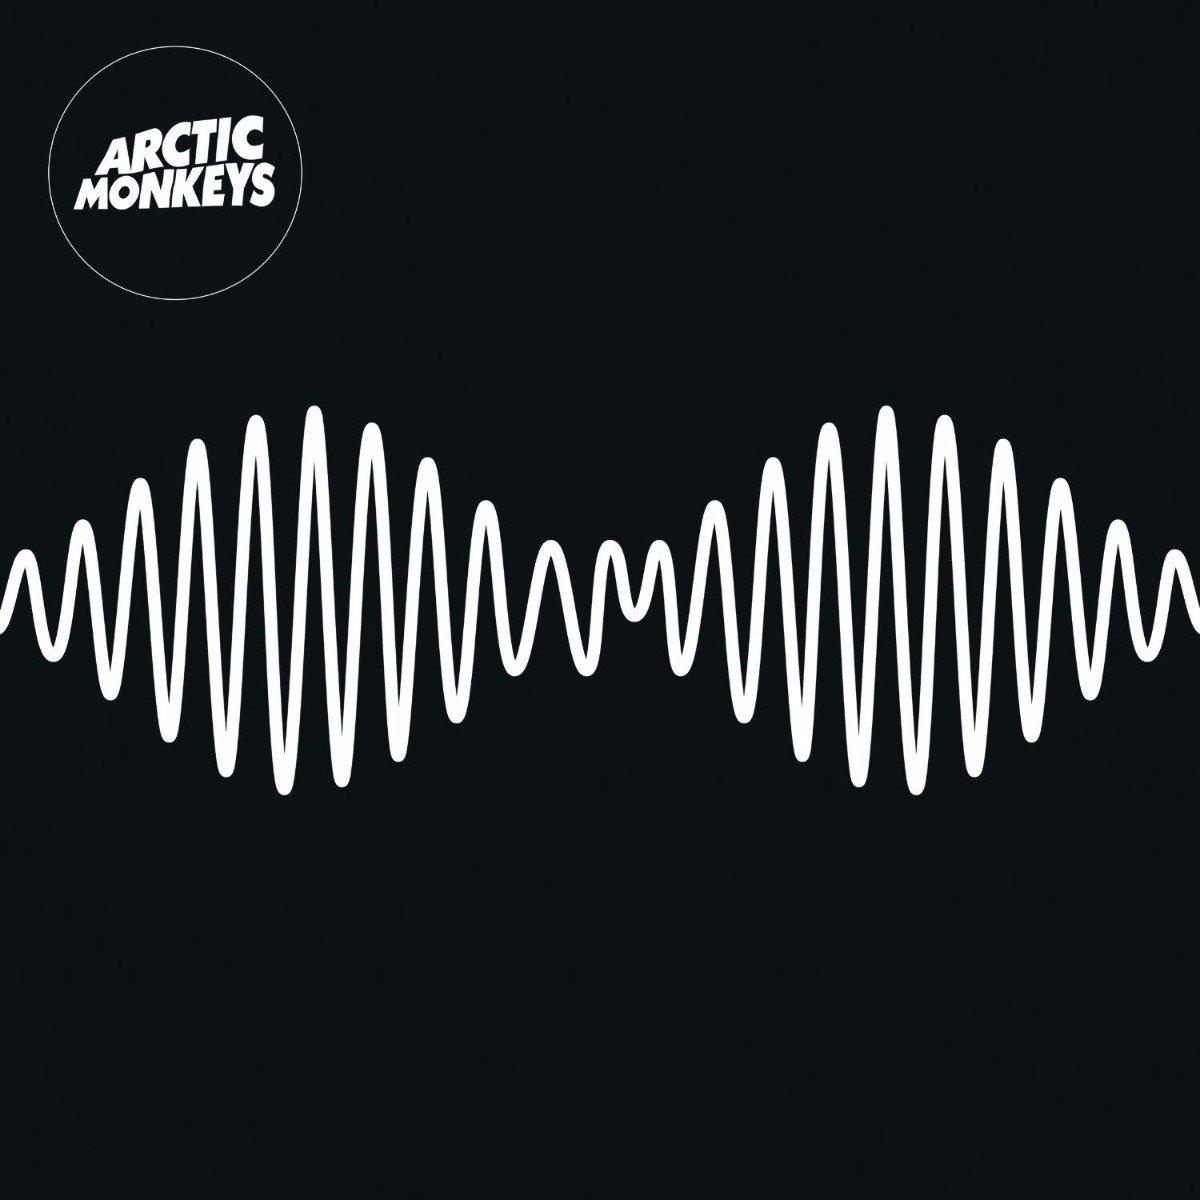 Arctic Monkeys Brasil's photo on Inglaterra